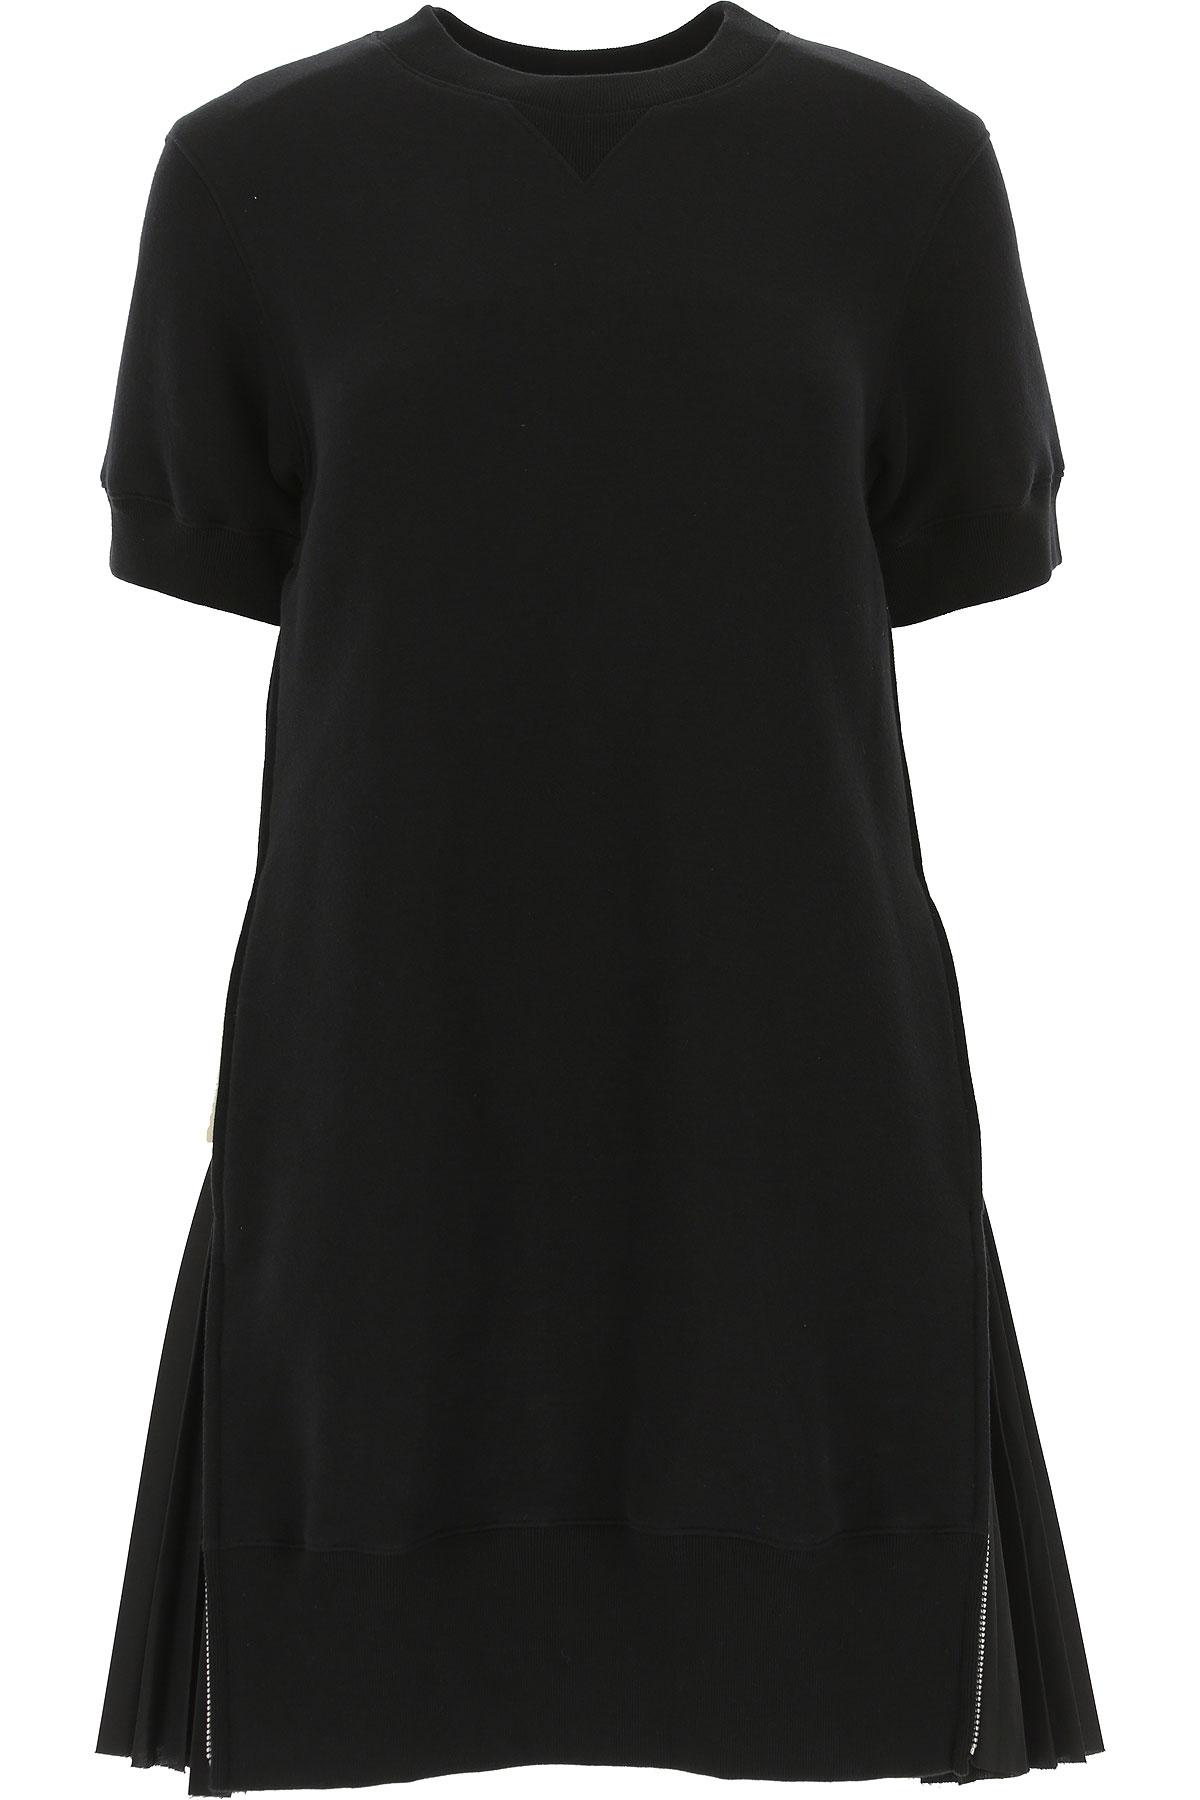 Image of Sacai Dress for Women, Evening Cocktail Party, Black, Cotton, 2017, US 2 - UK 6 - EU 36 - IT 40 US 4 - UK 8 - EU 38 - IT 42